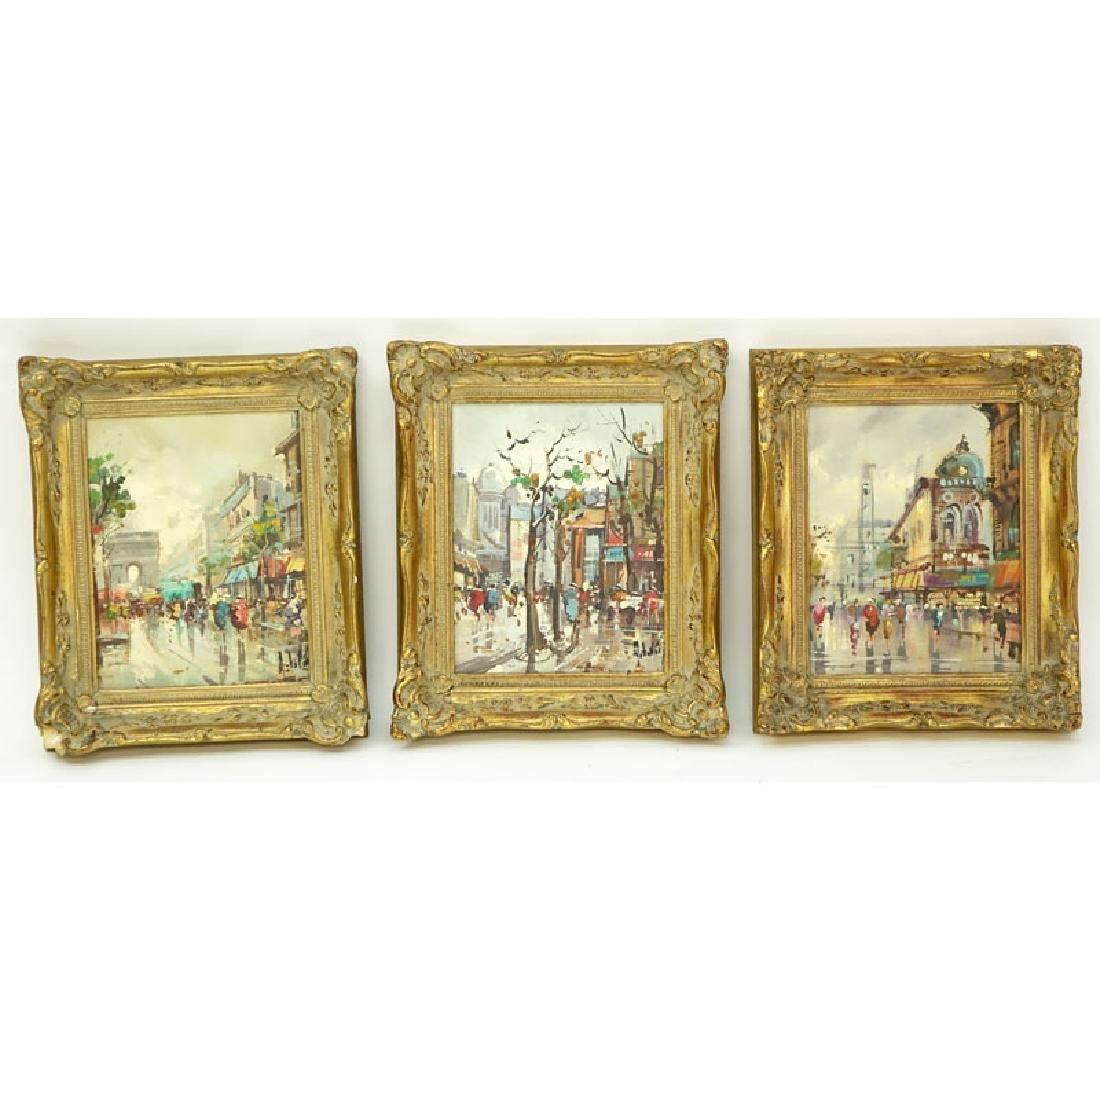 Three (3) Antonio DeVity, Italian (1901 - 1993) Oil on